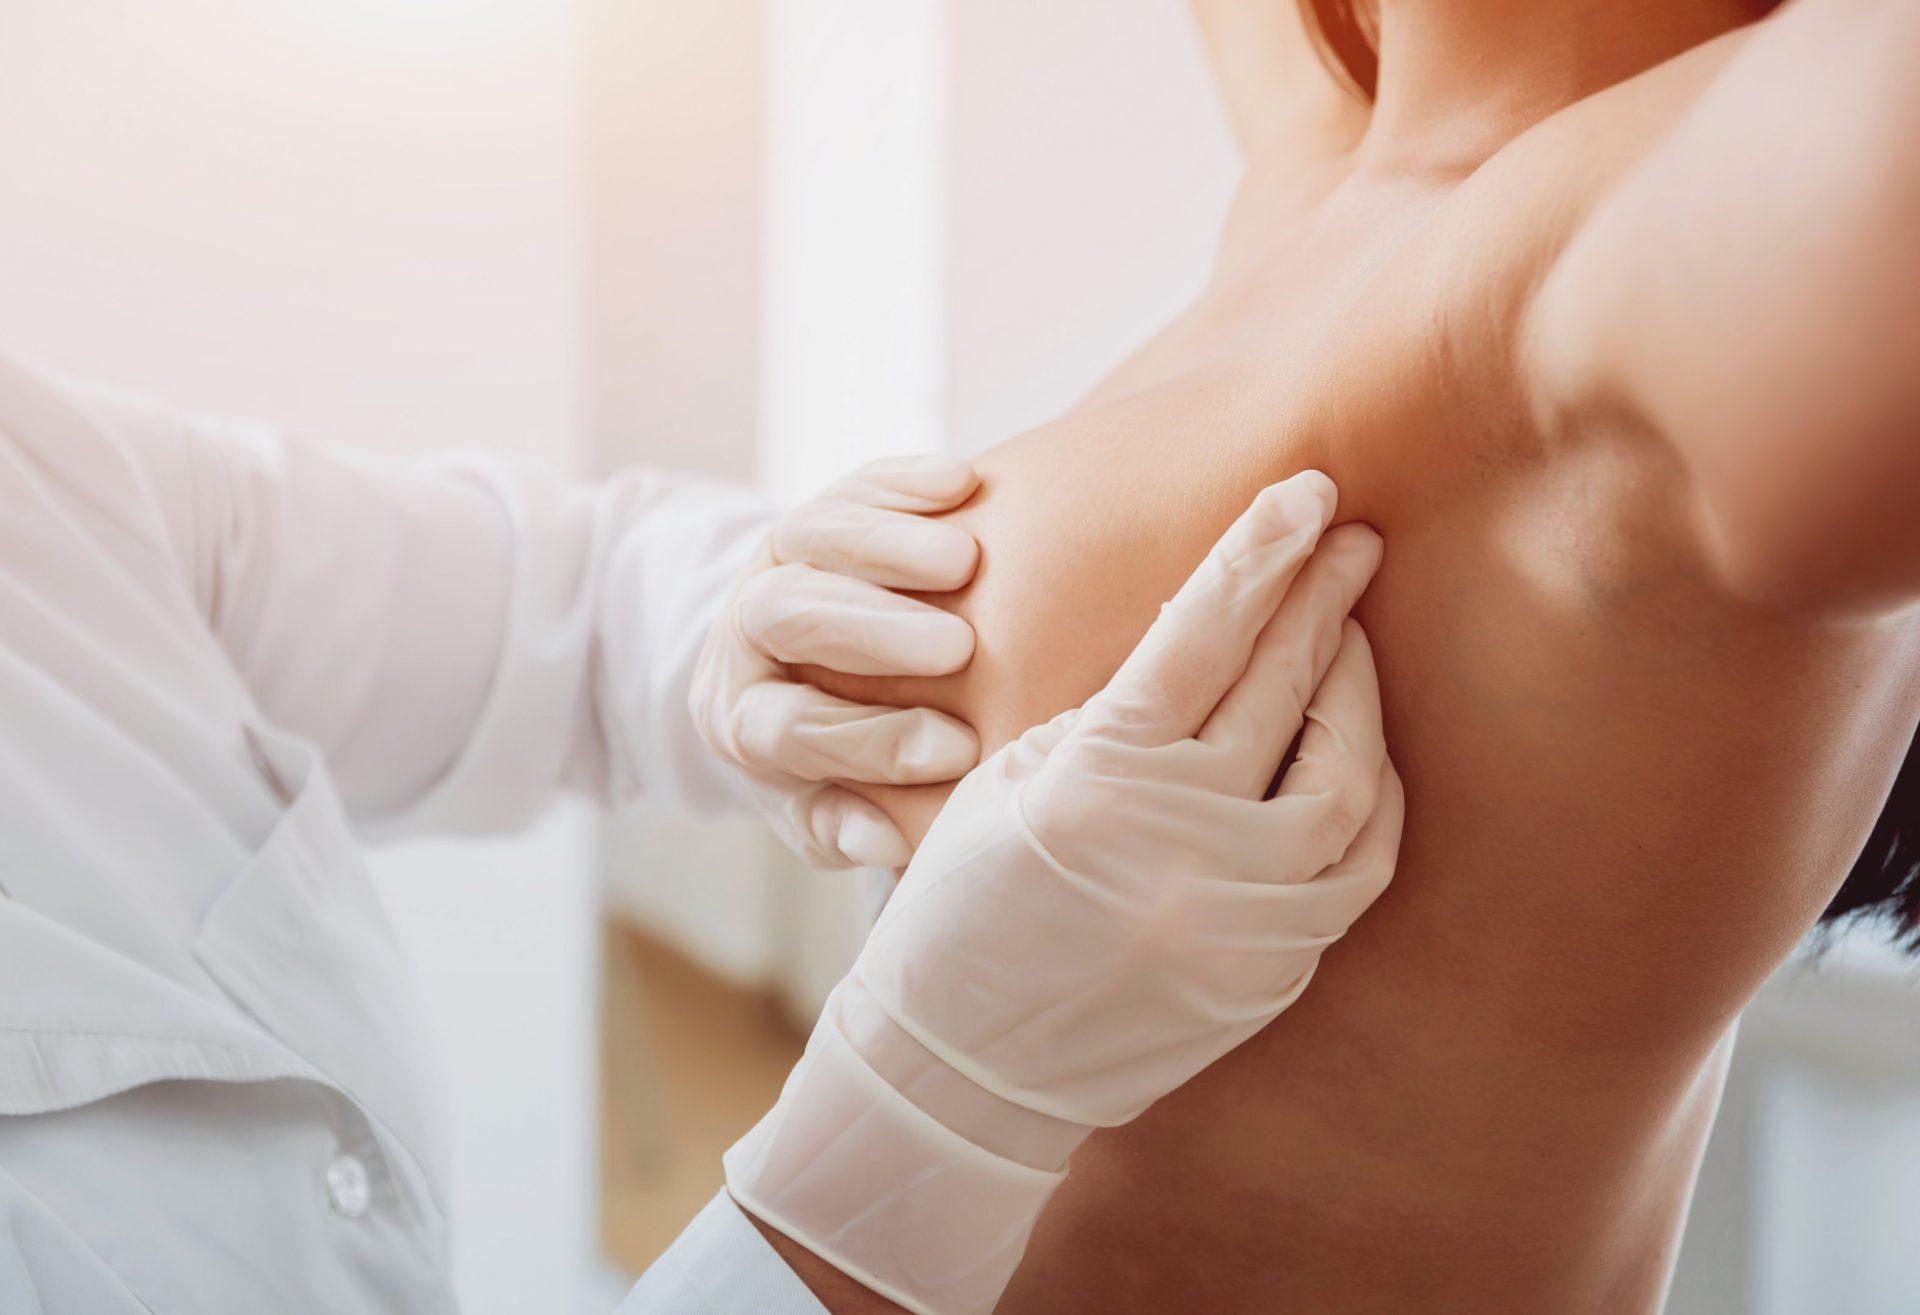 Drenaje linfatico post aumento de senos